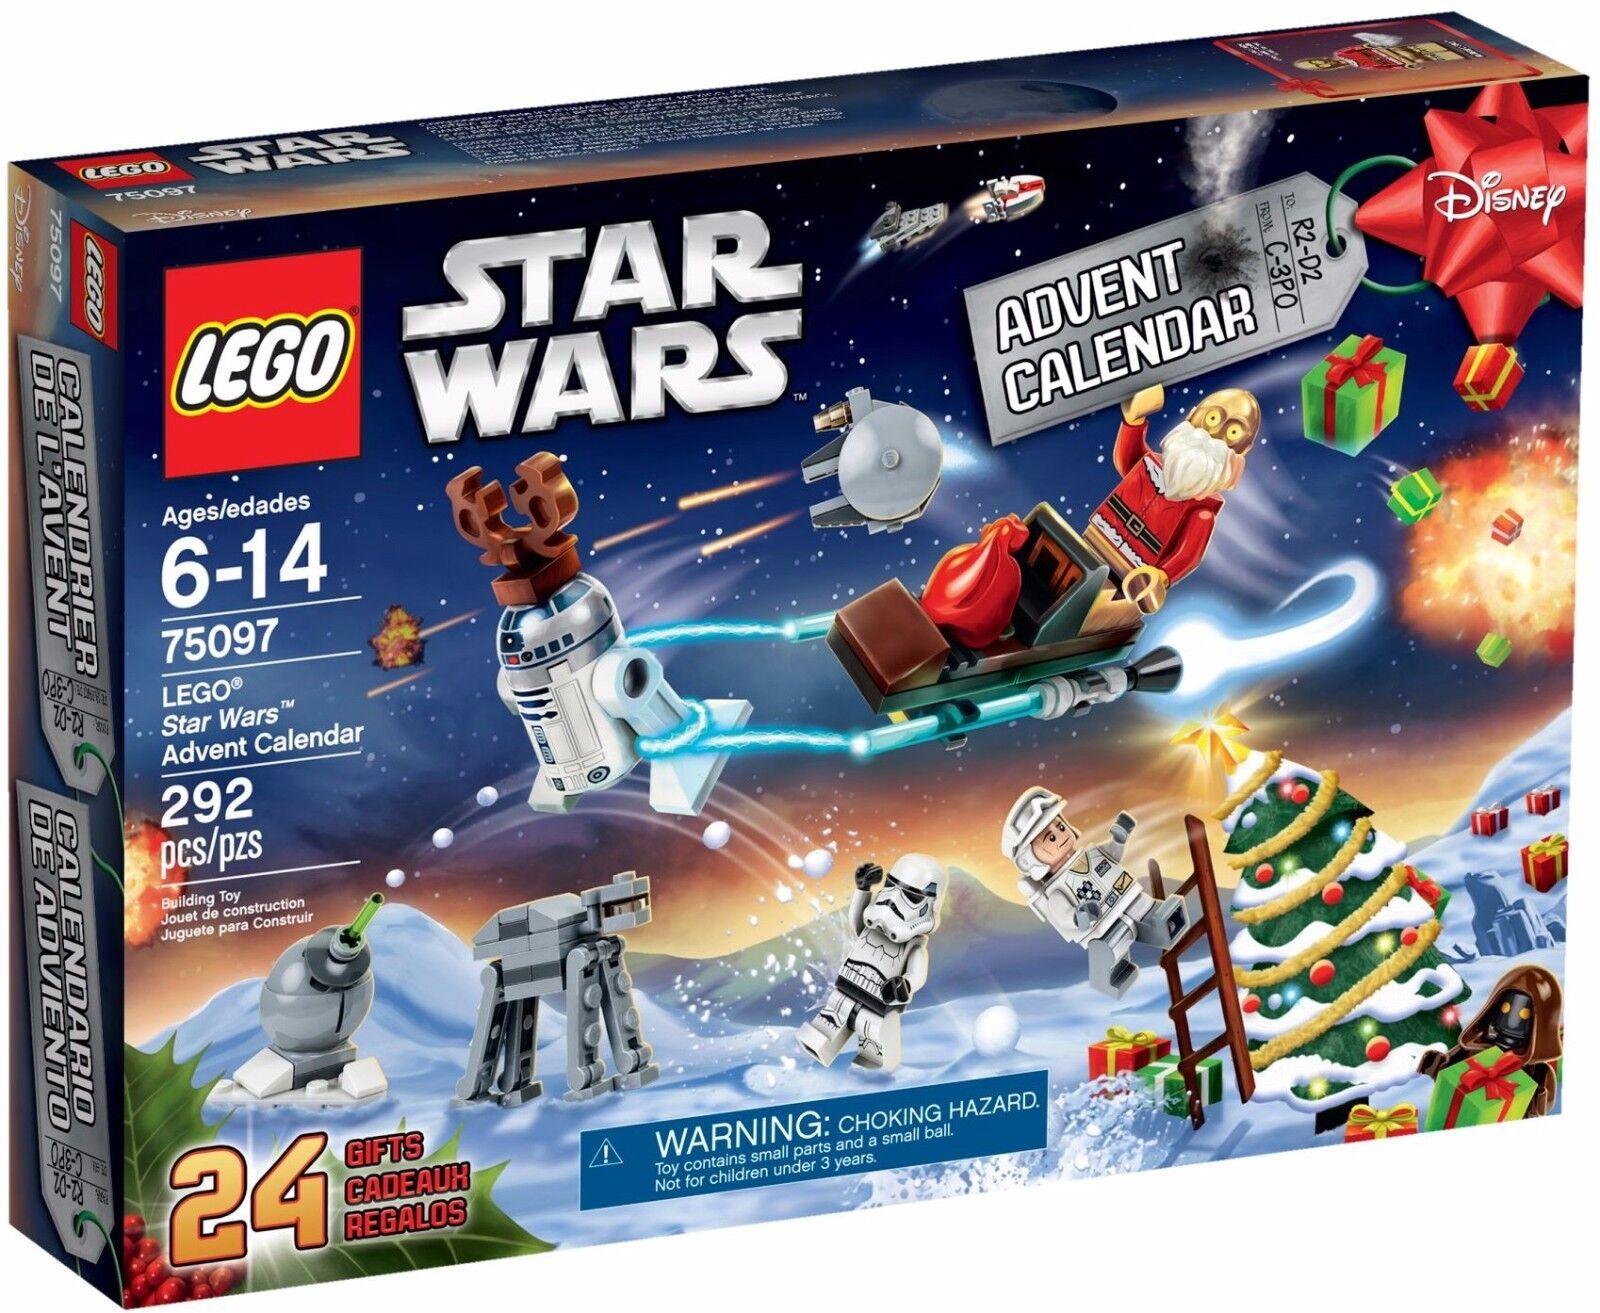 2015 LEGO estrella guerras 75097 Advent Calendar Kit bambini Christmas  The Force Awakens   elementi di novità